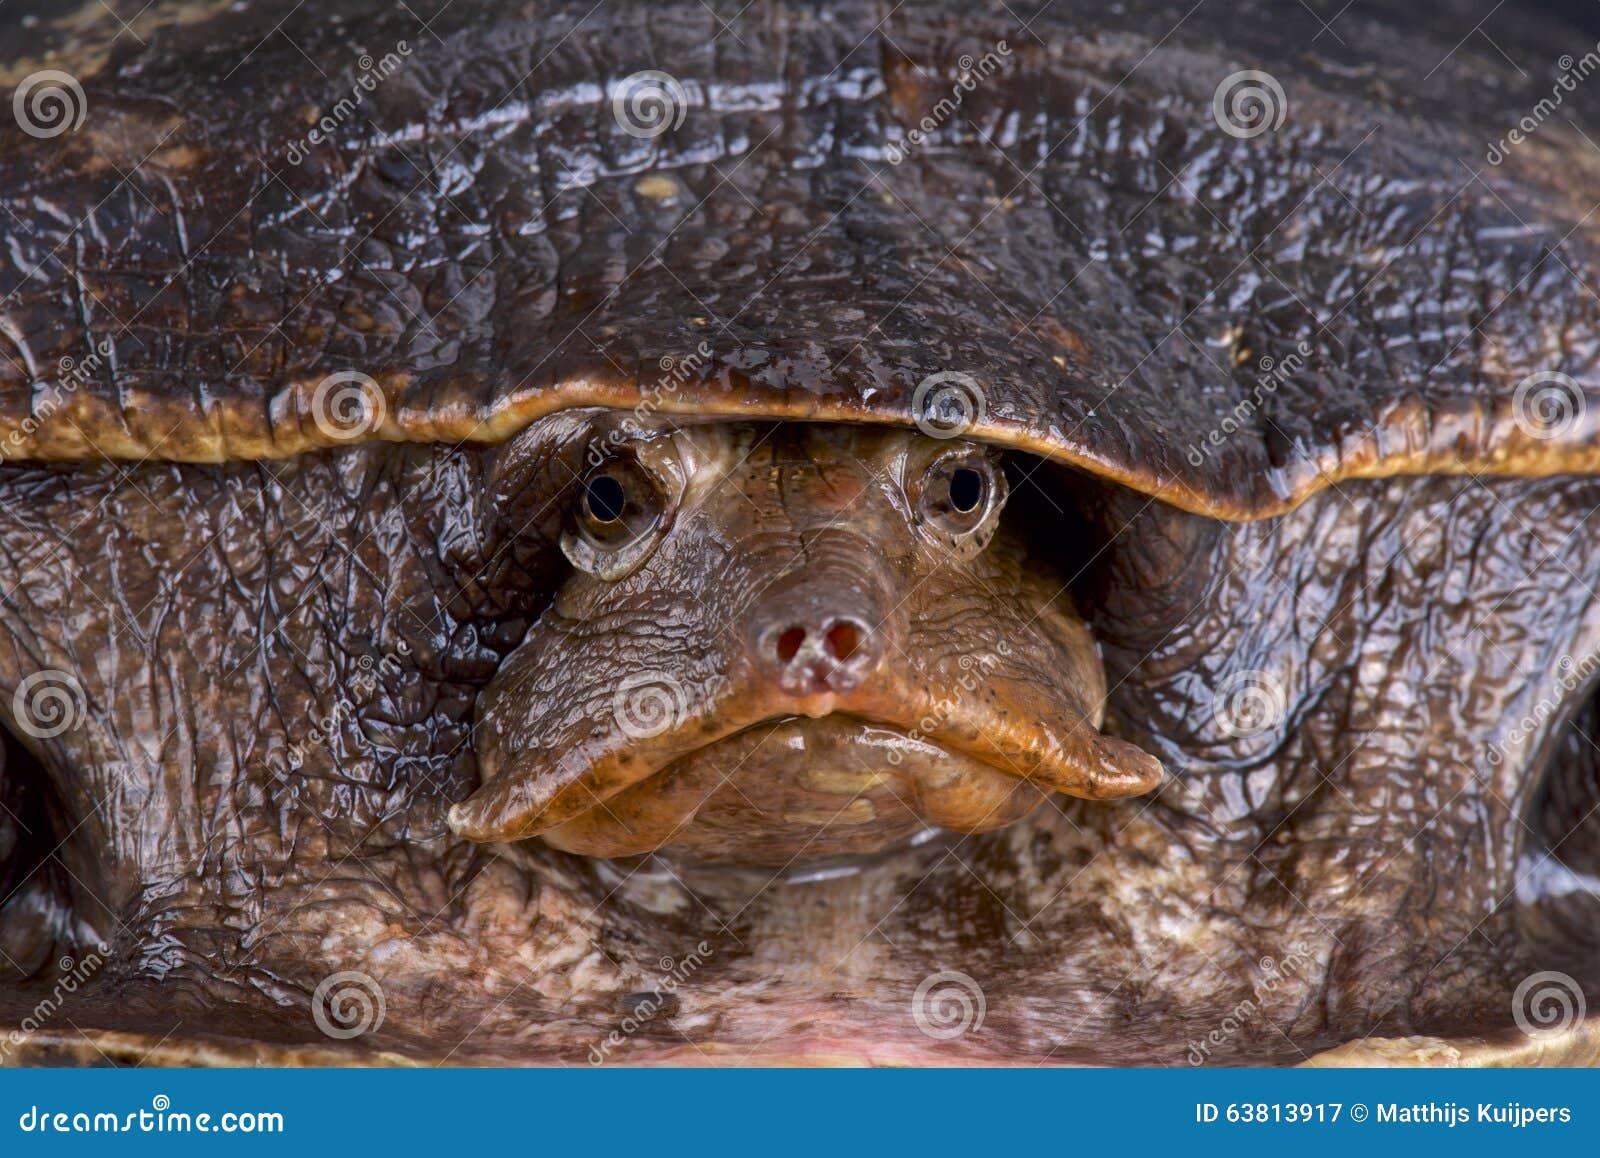 Aubry S Flapshell Turtle Cycloderma Aubryi Stock Photo